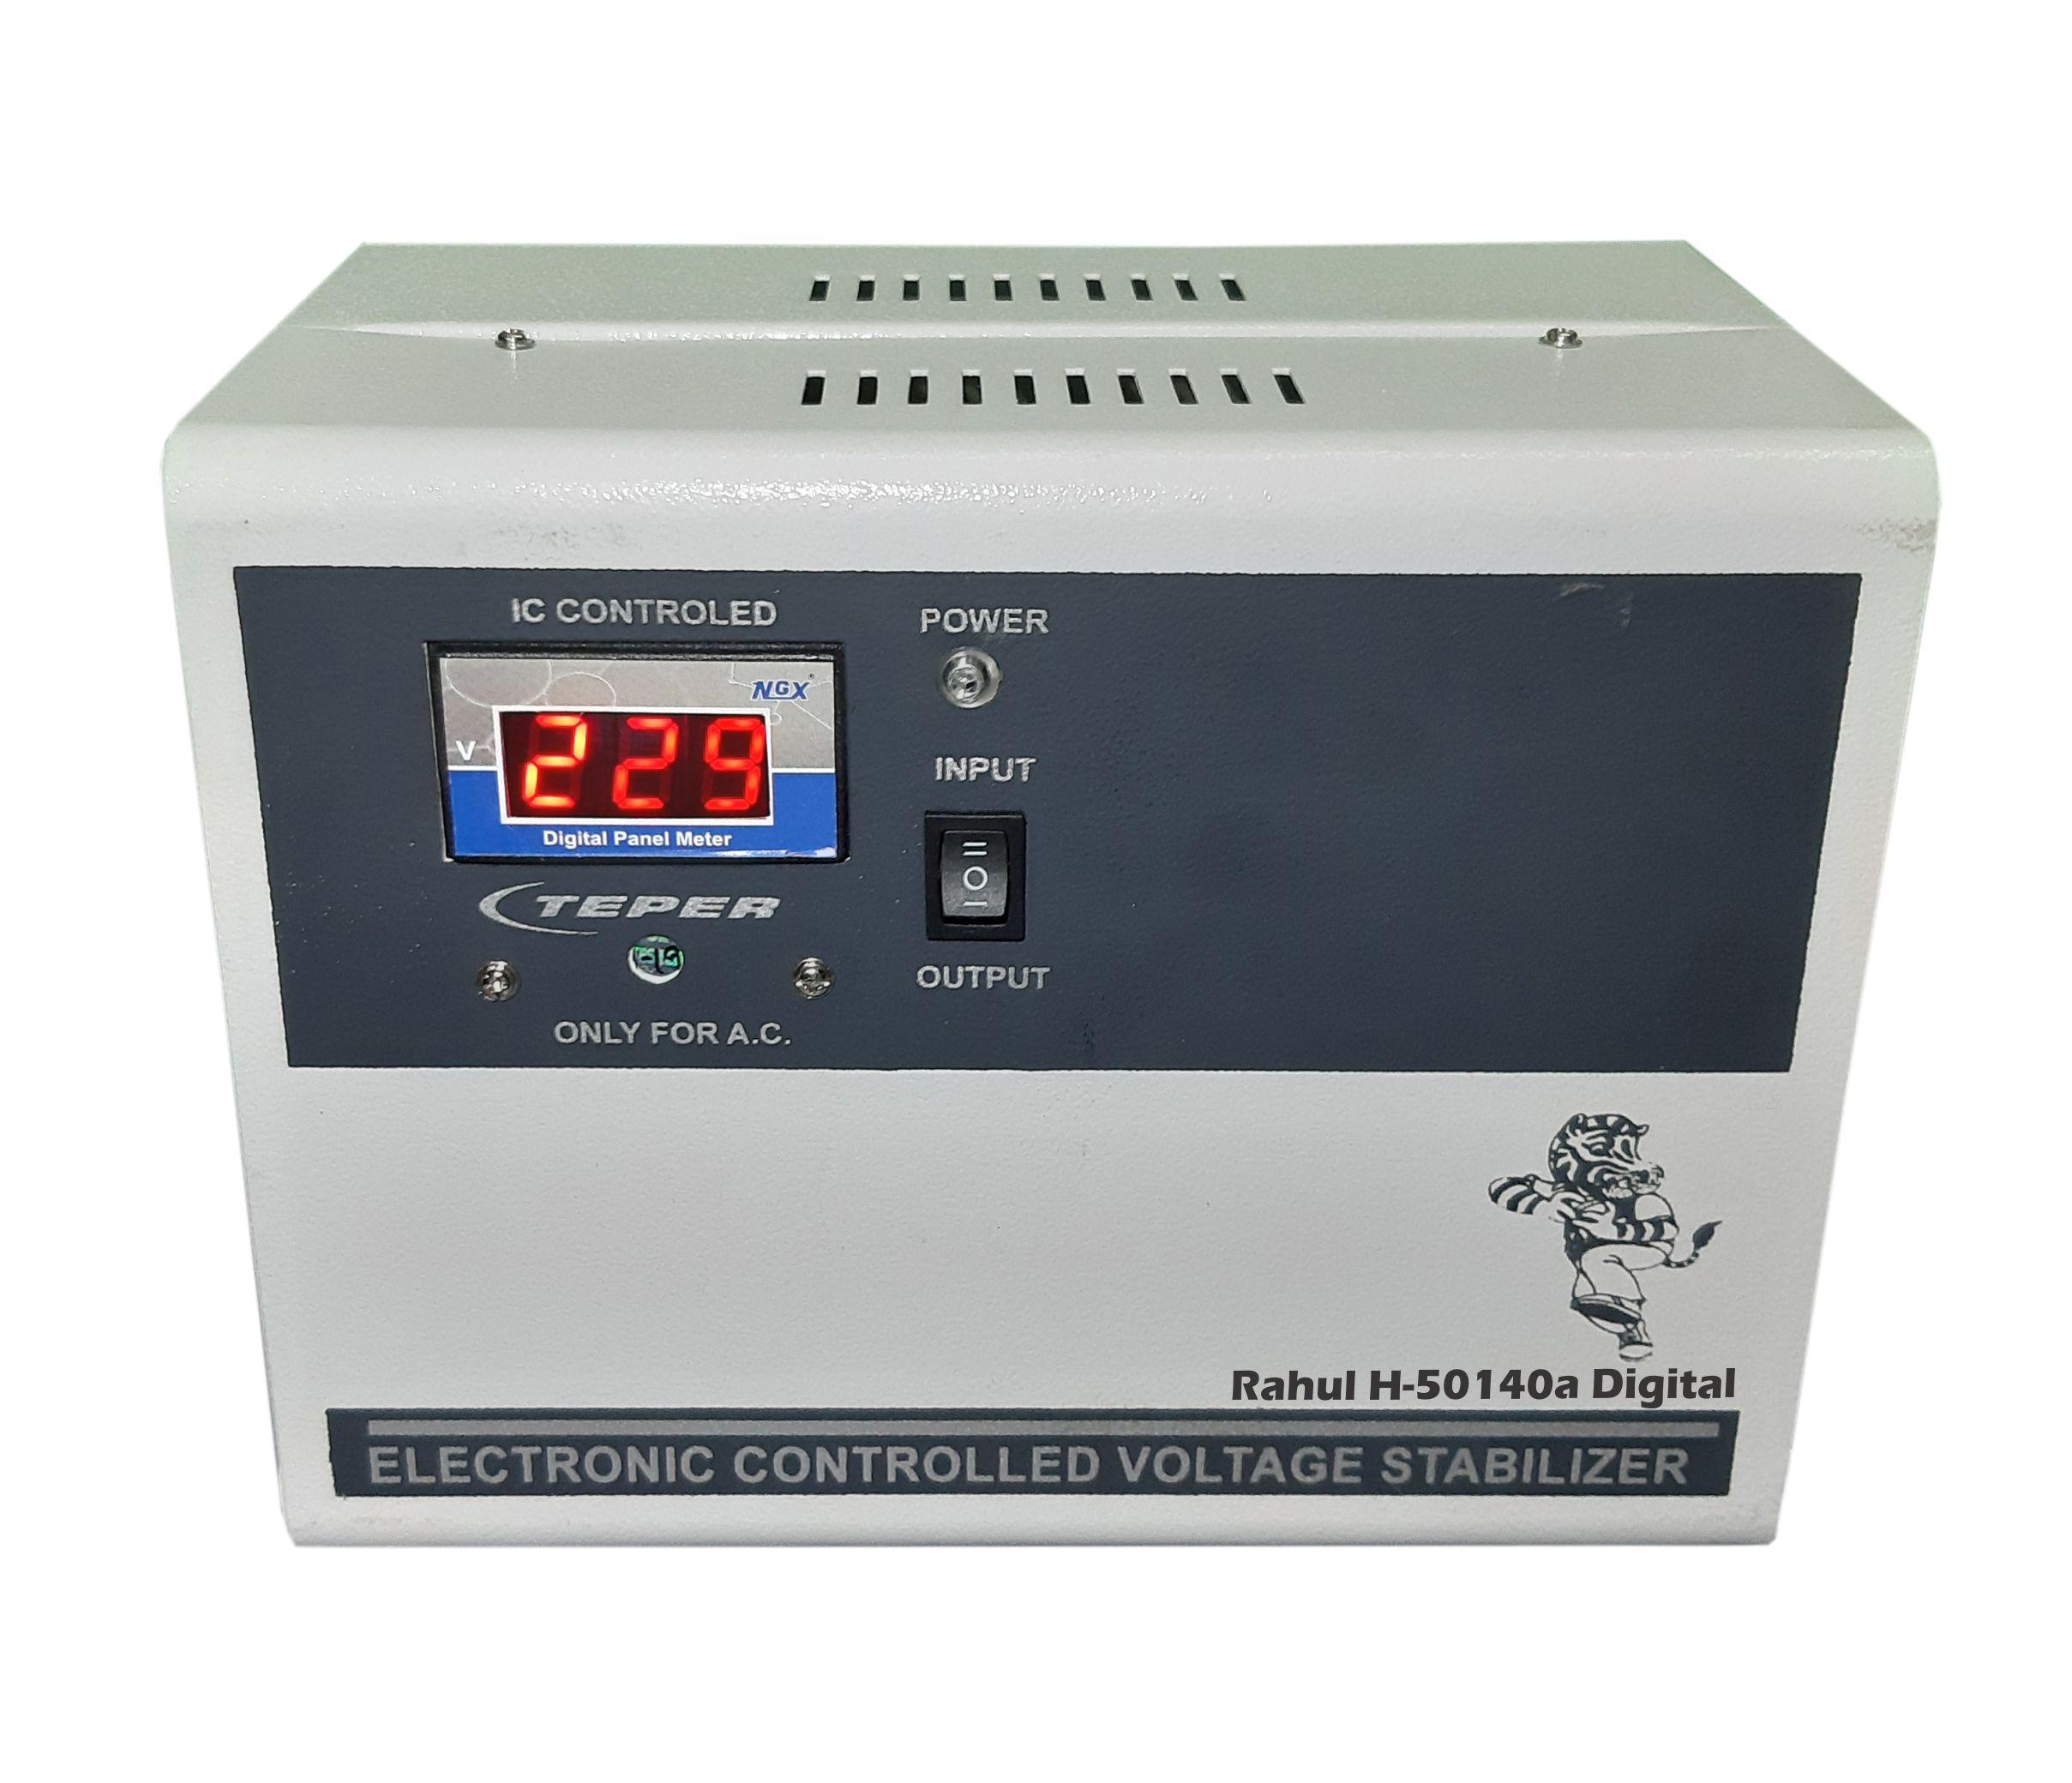 Rahul H 50140a Digital 5 Kva/16 Amp In Put 140 280 Volt 3 BoosterAutomatic Digital Voltage Stabilizer